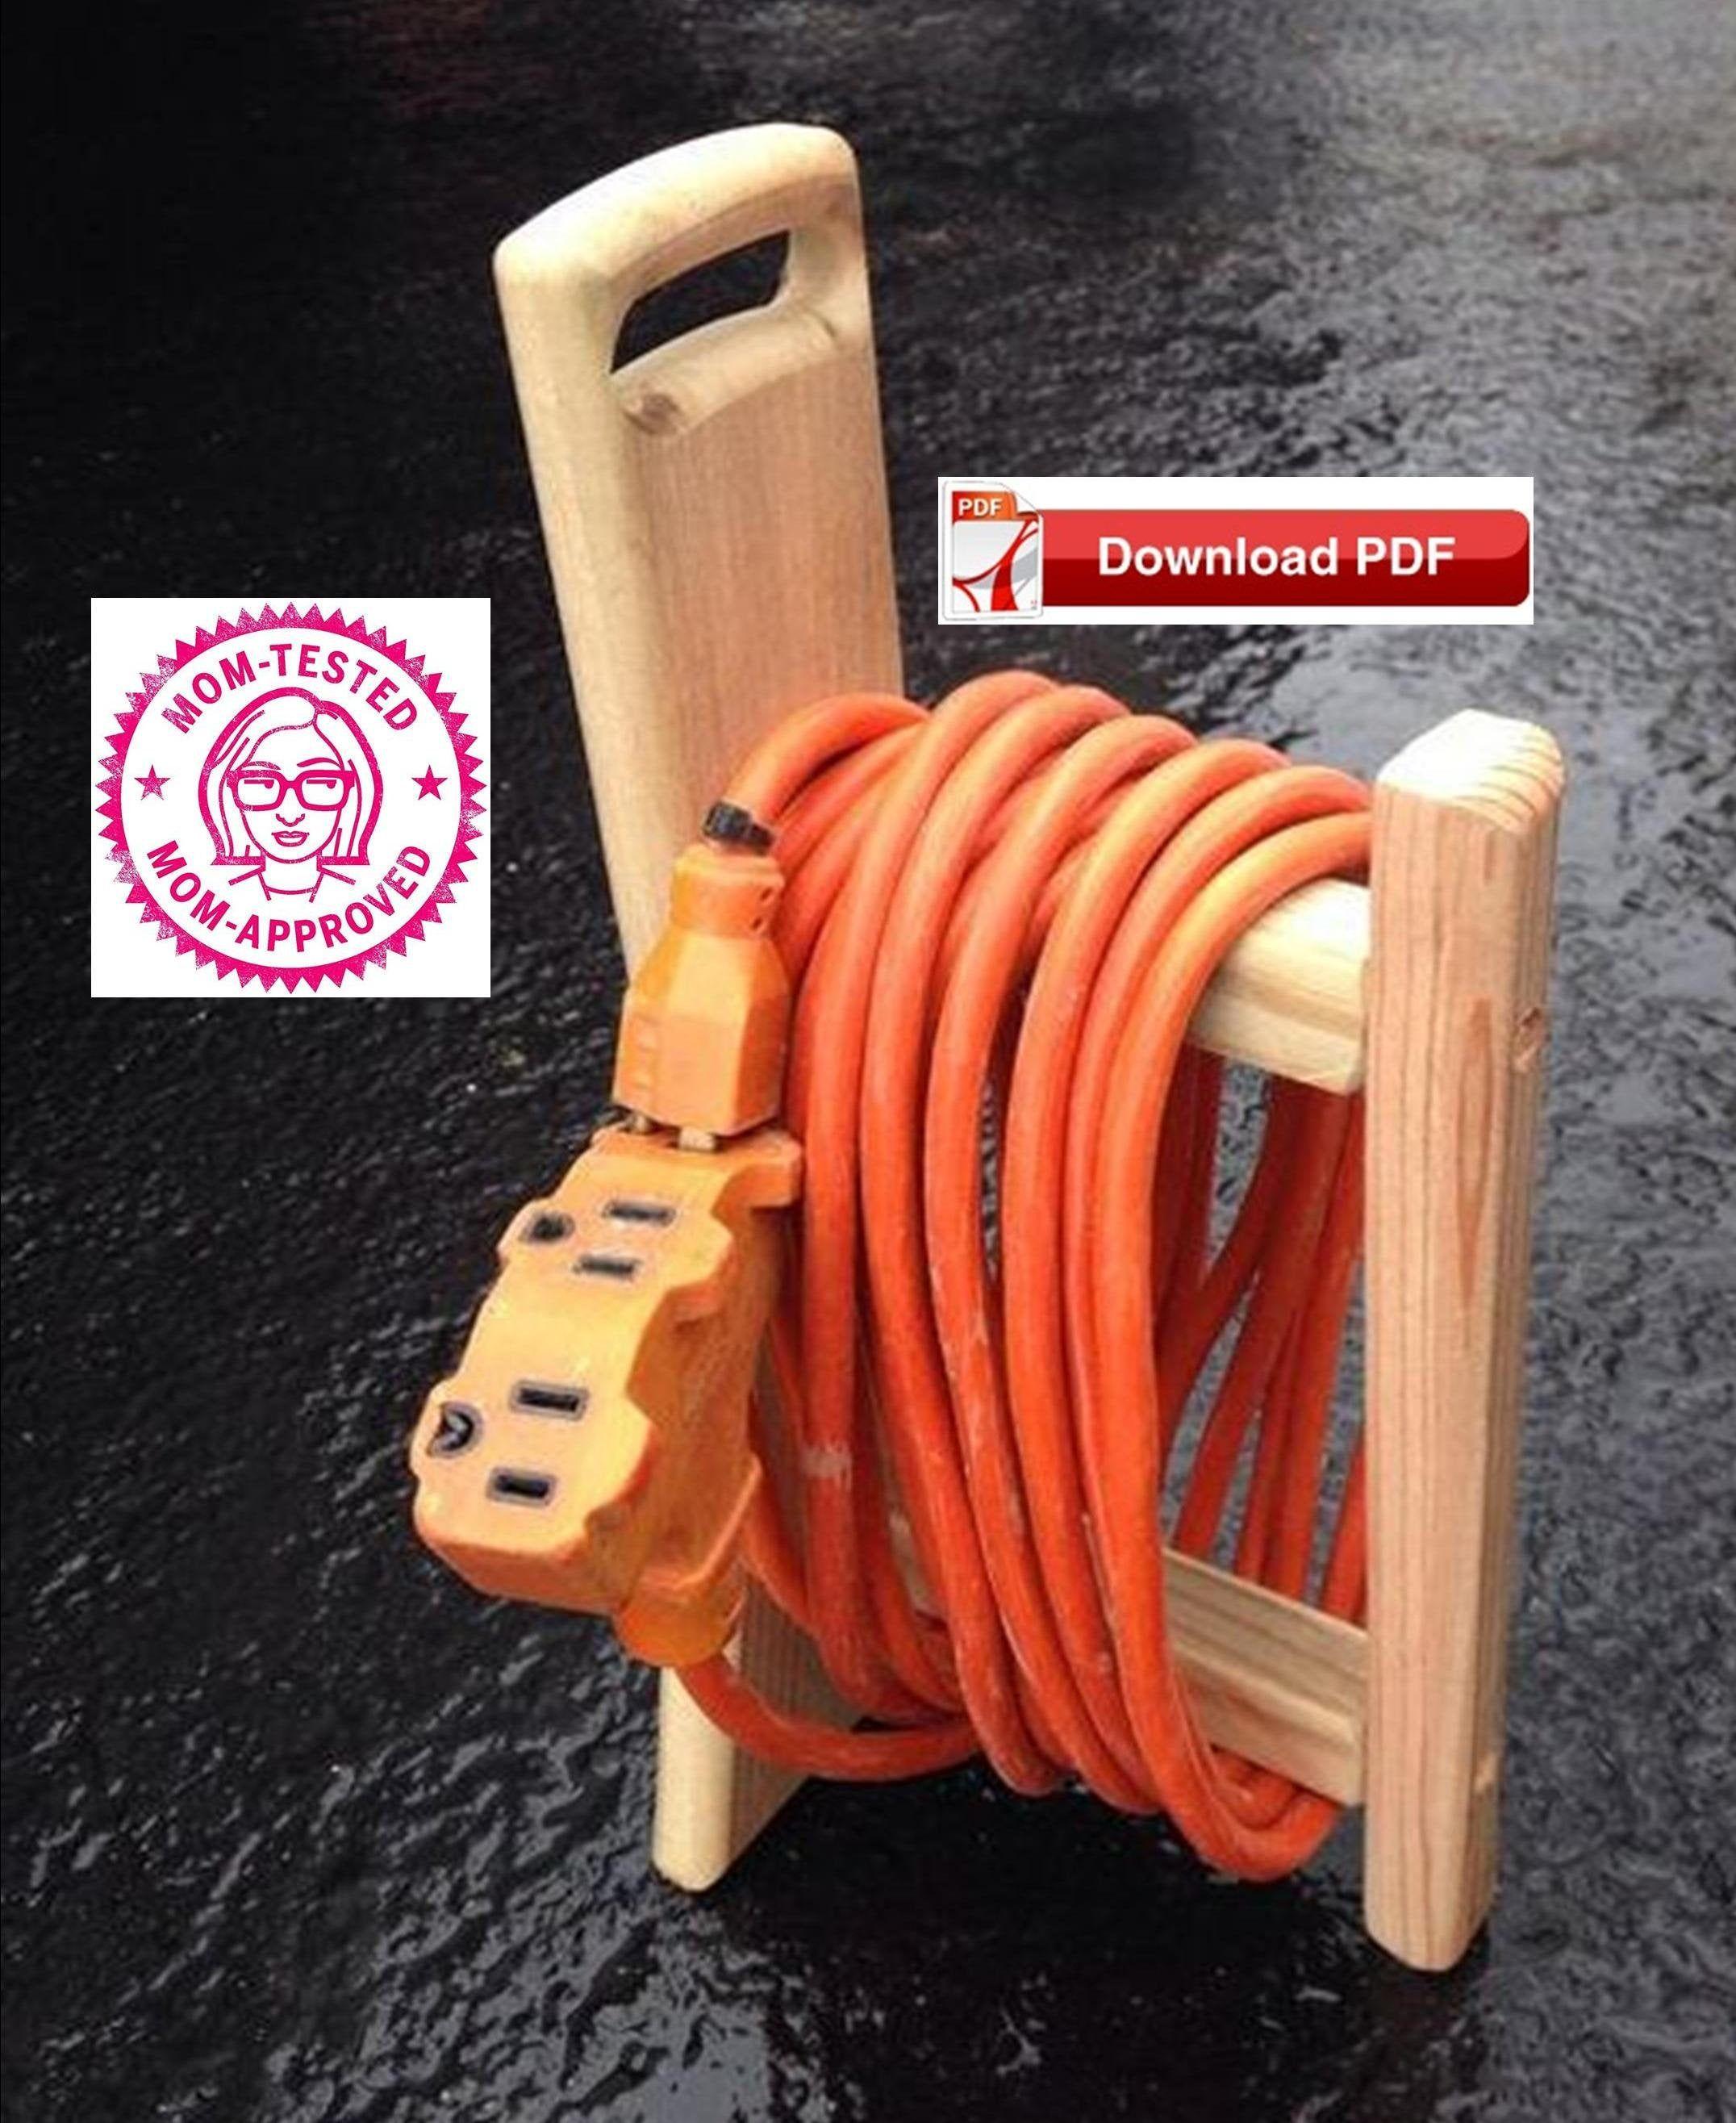 Power Cord Caddy Plan Power Cord Holder Plan Power Cord Storage Plan Outdoor Power Cord Caddy Plan Power Cord Organizer Cord Organize Pdf Power Cord Organizer Power Cord Storage Cord Storage